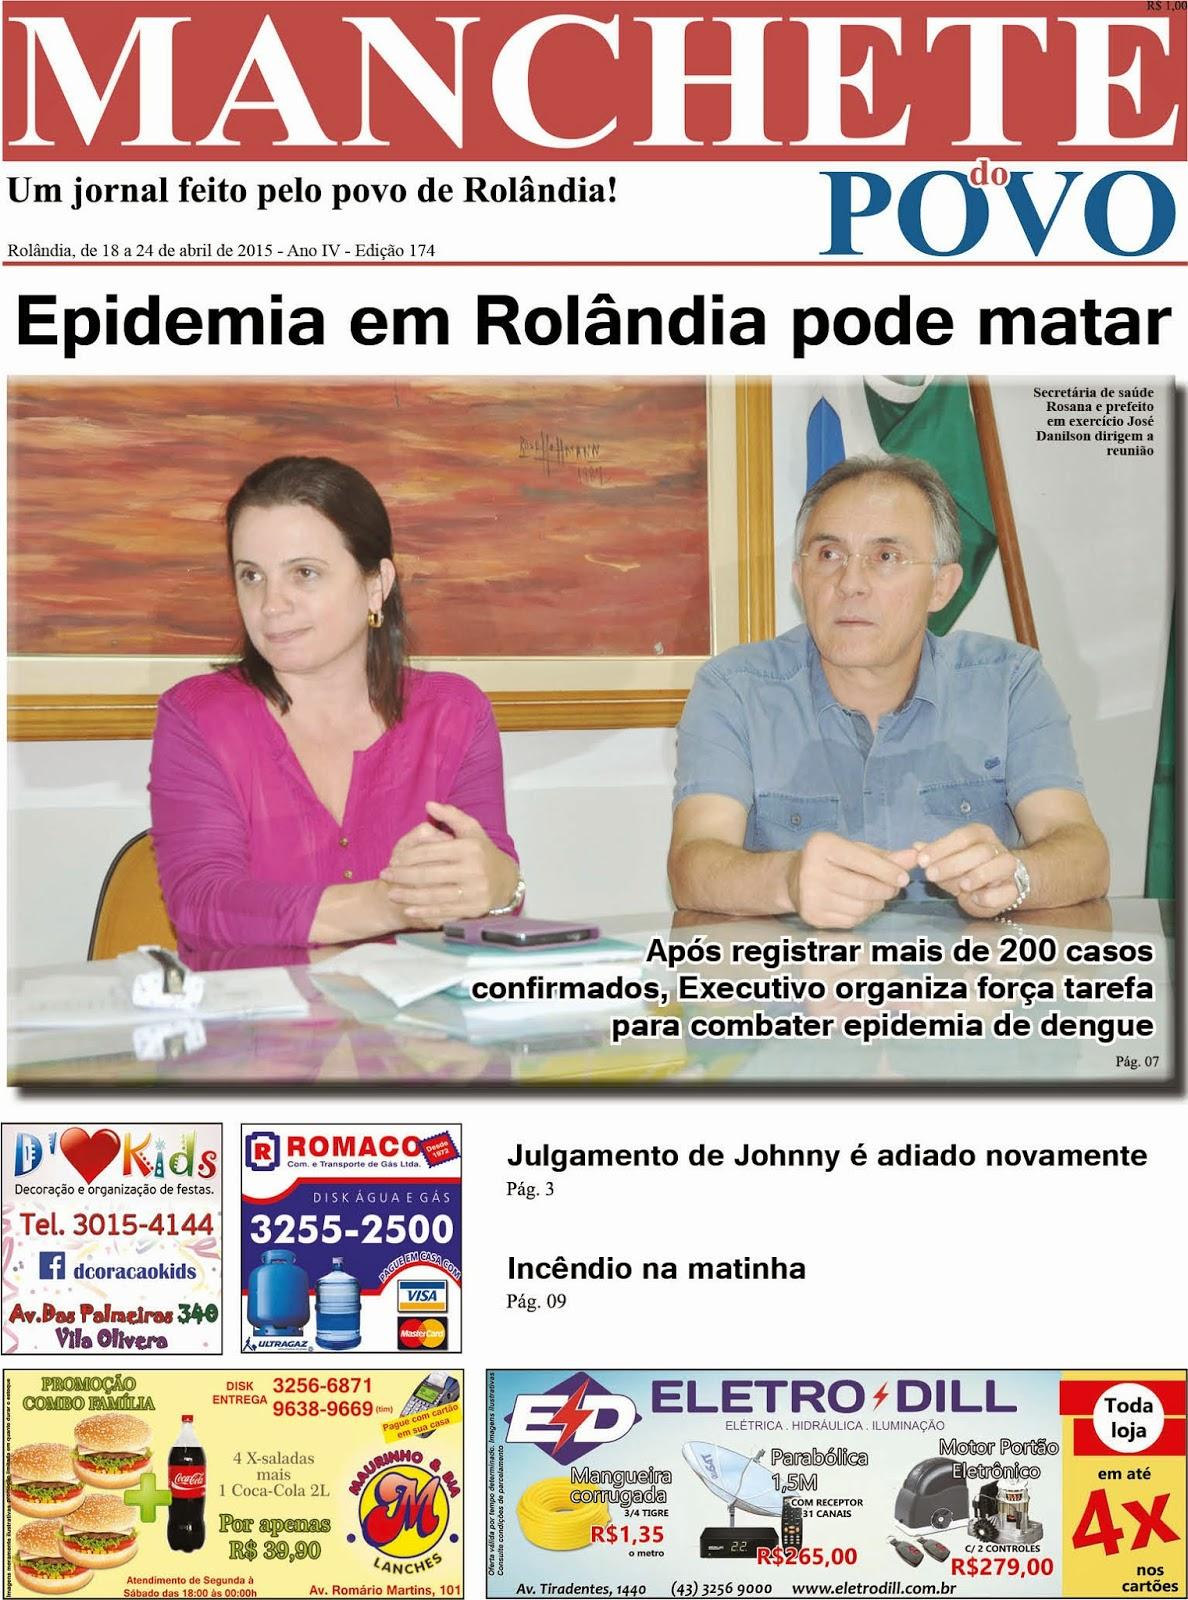 http://www.youblisher.com/p/1119180-Jornal-Manchete-do-Povo/